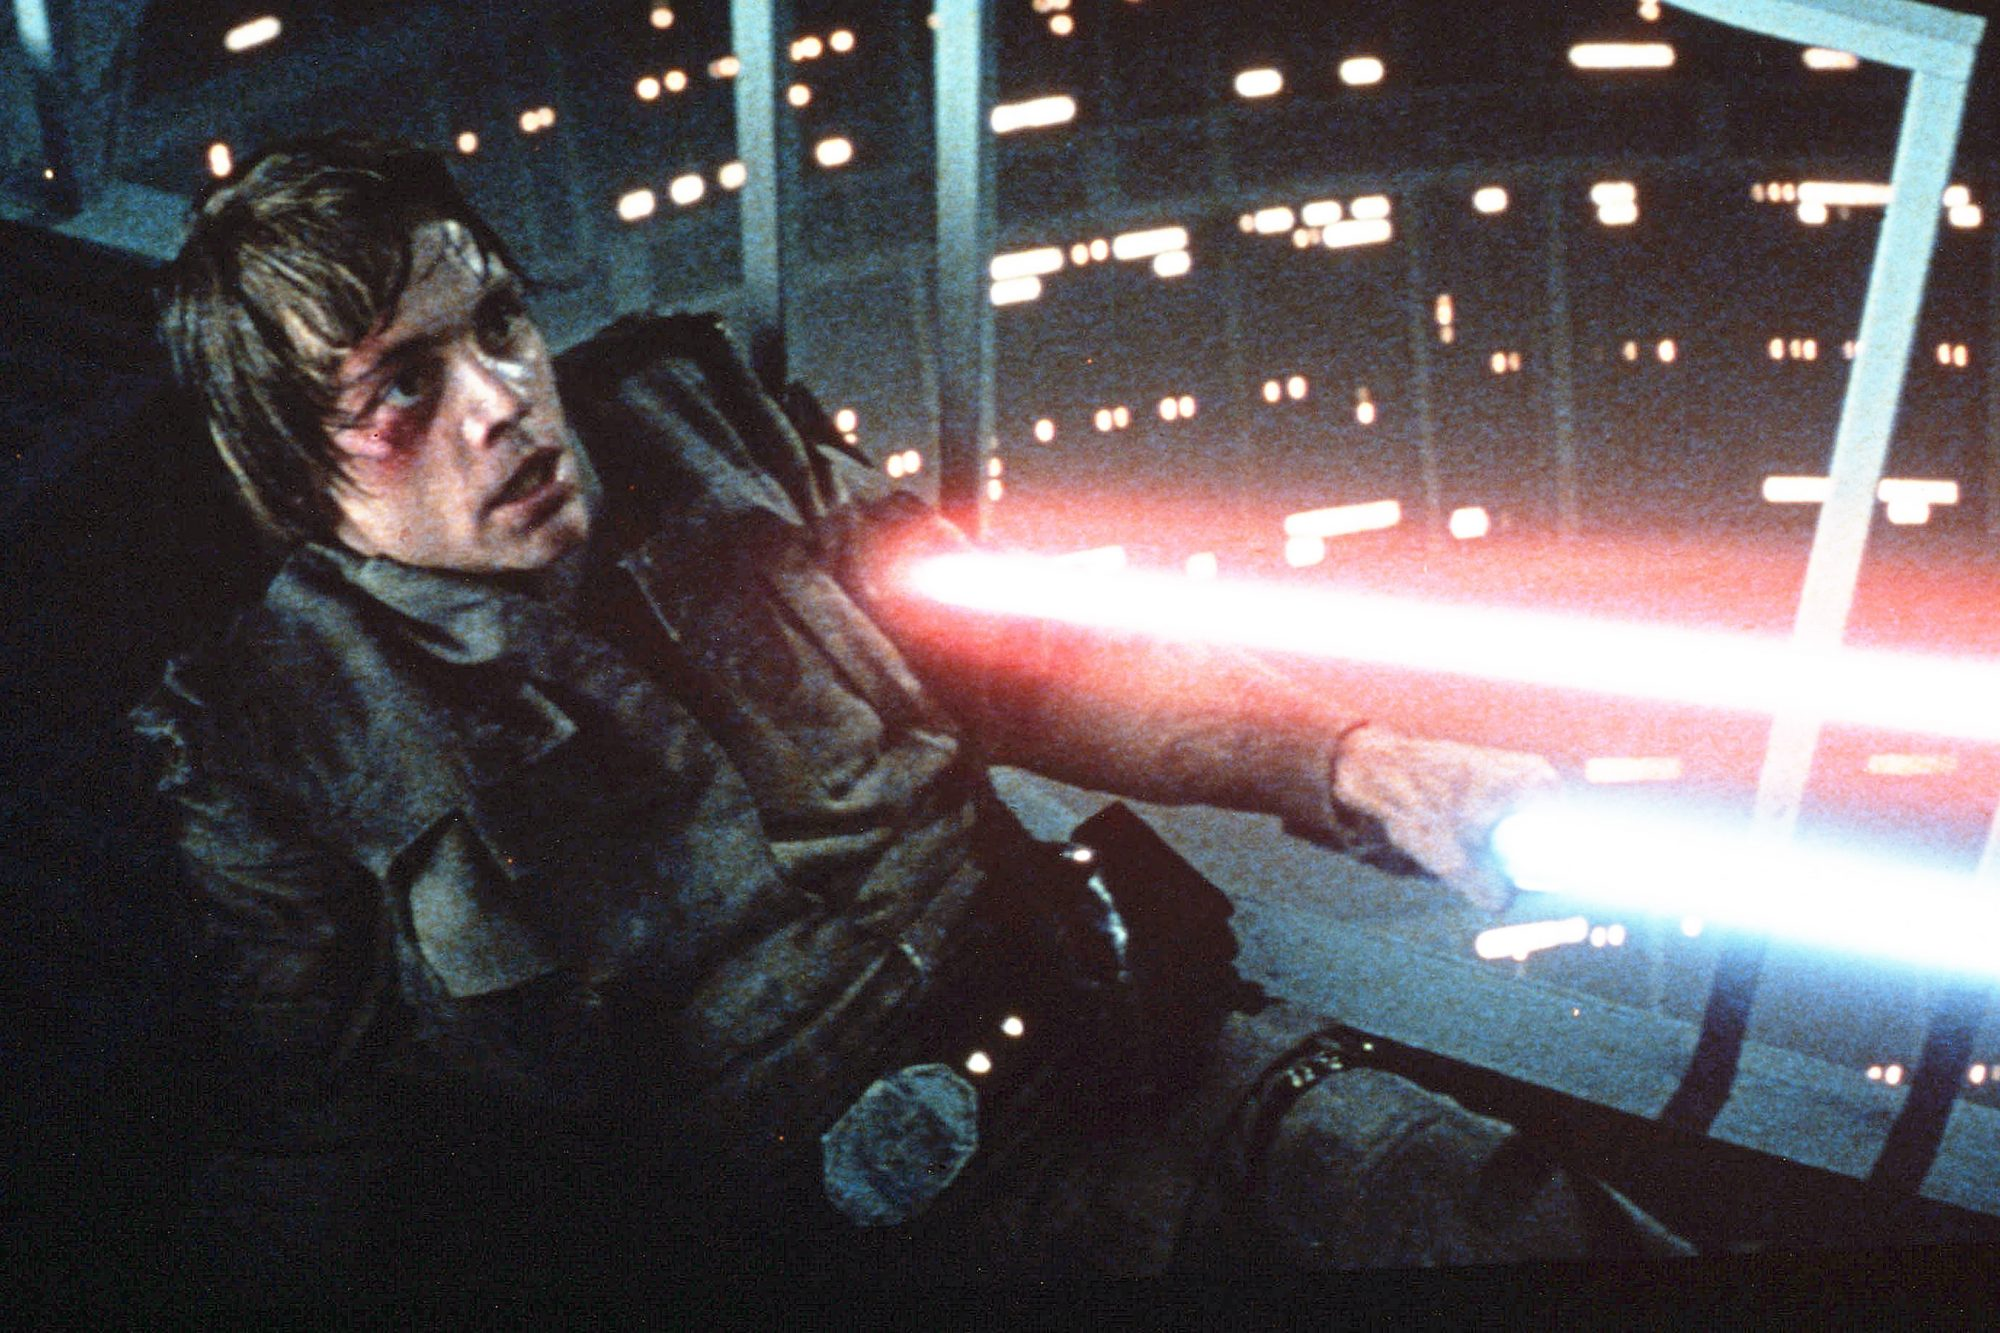 Mark Hamill The Star Wars Episode V - Empire Strikes Back - 1980